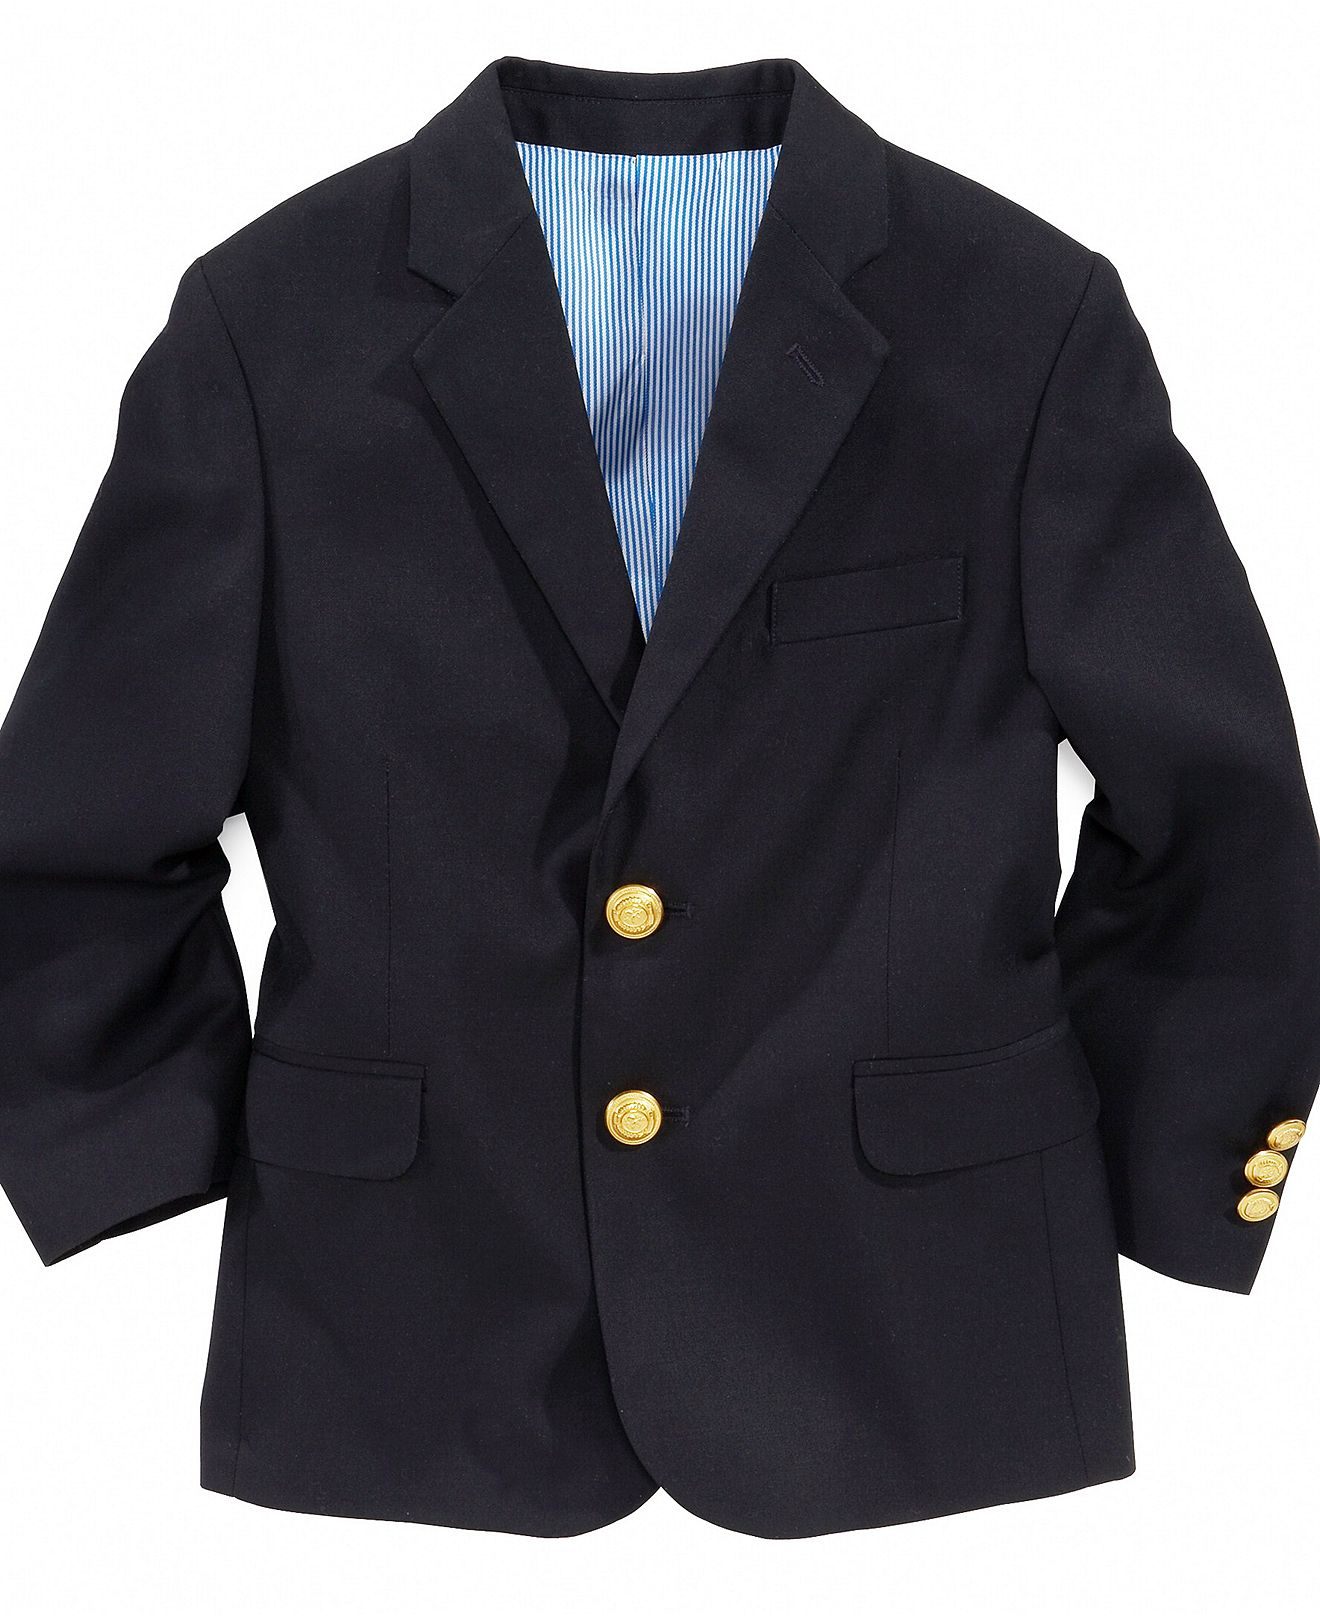 Костюм детский OTHER 2014 Tommy Hilfiger 2-7 детский костюм cicie 1111 2014